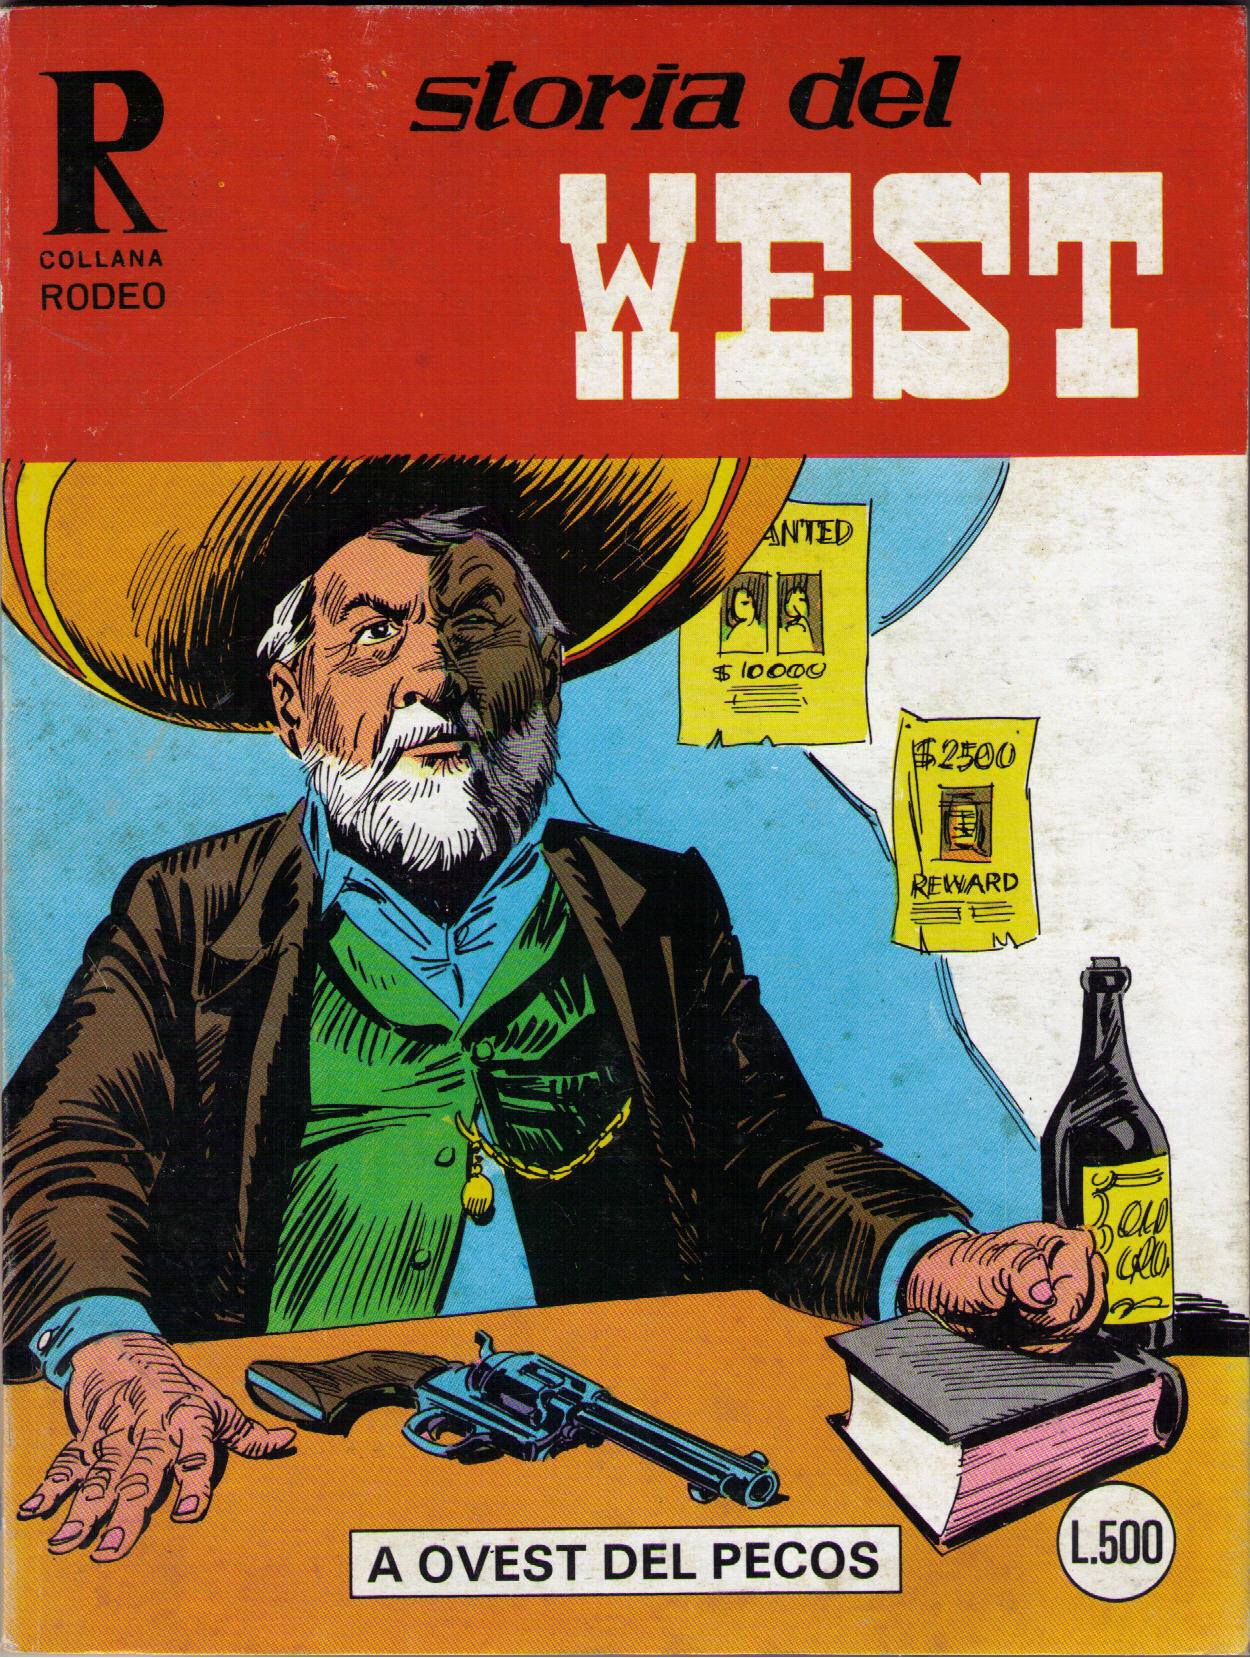 Storia del West n.68 (Collana Rodeo n. 156)